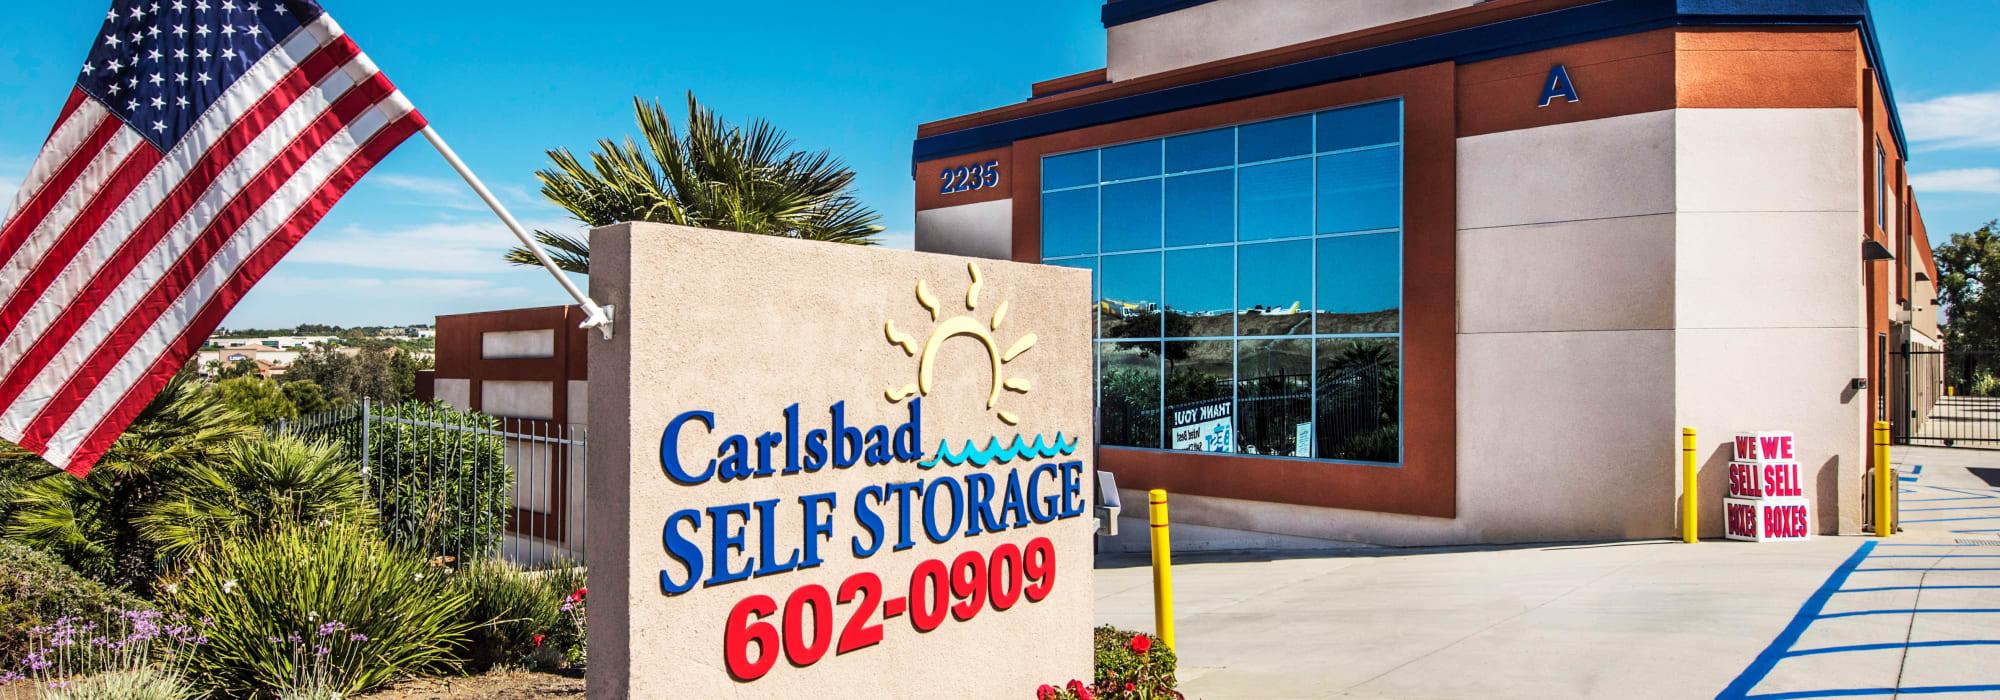 Branding on the exterior of Carlsbad Self Storage in Carlsbad, California